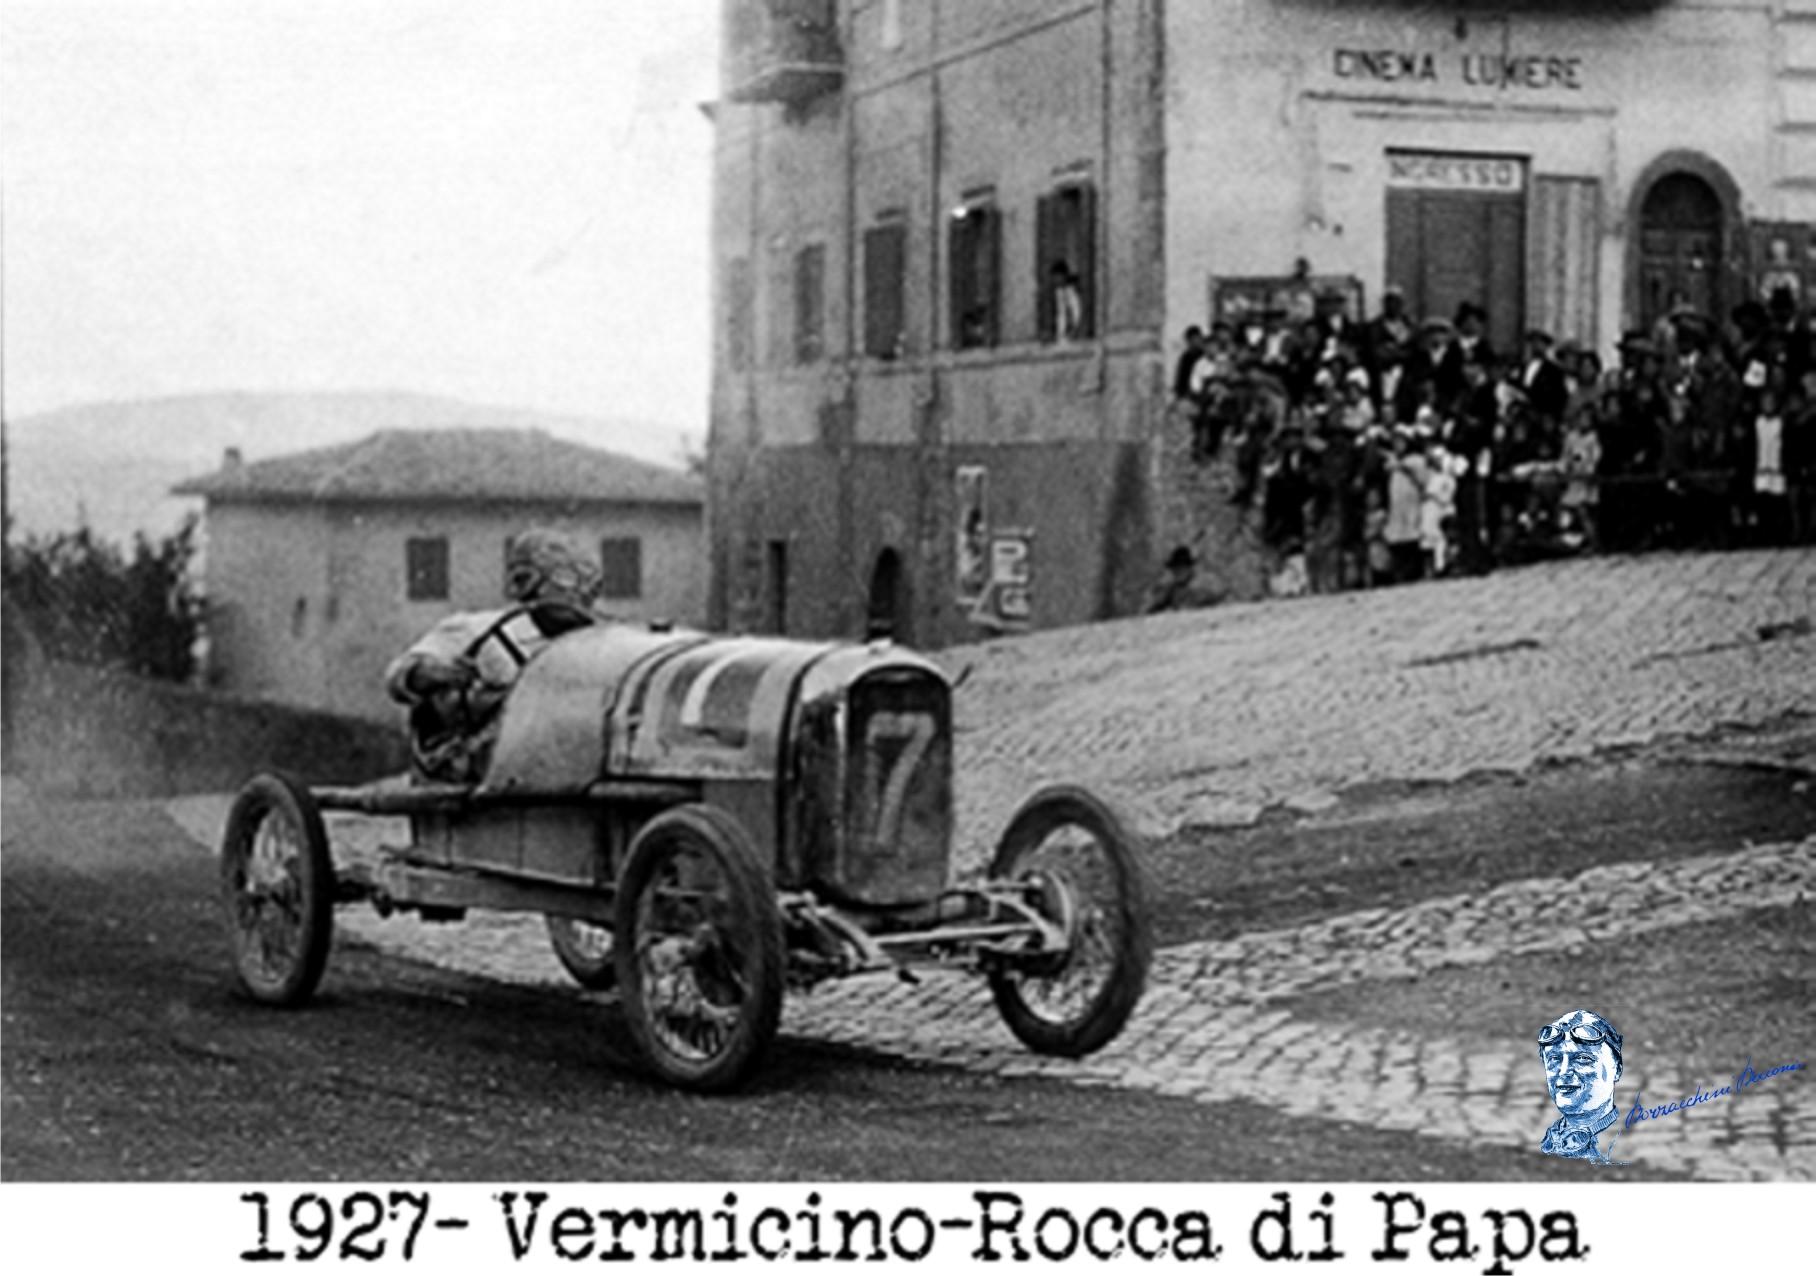 1927 vermicino rocca di papa 9